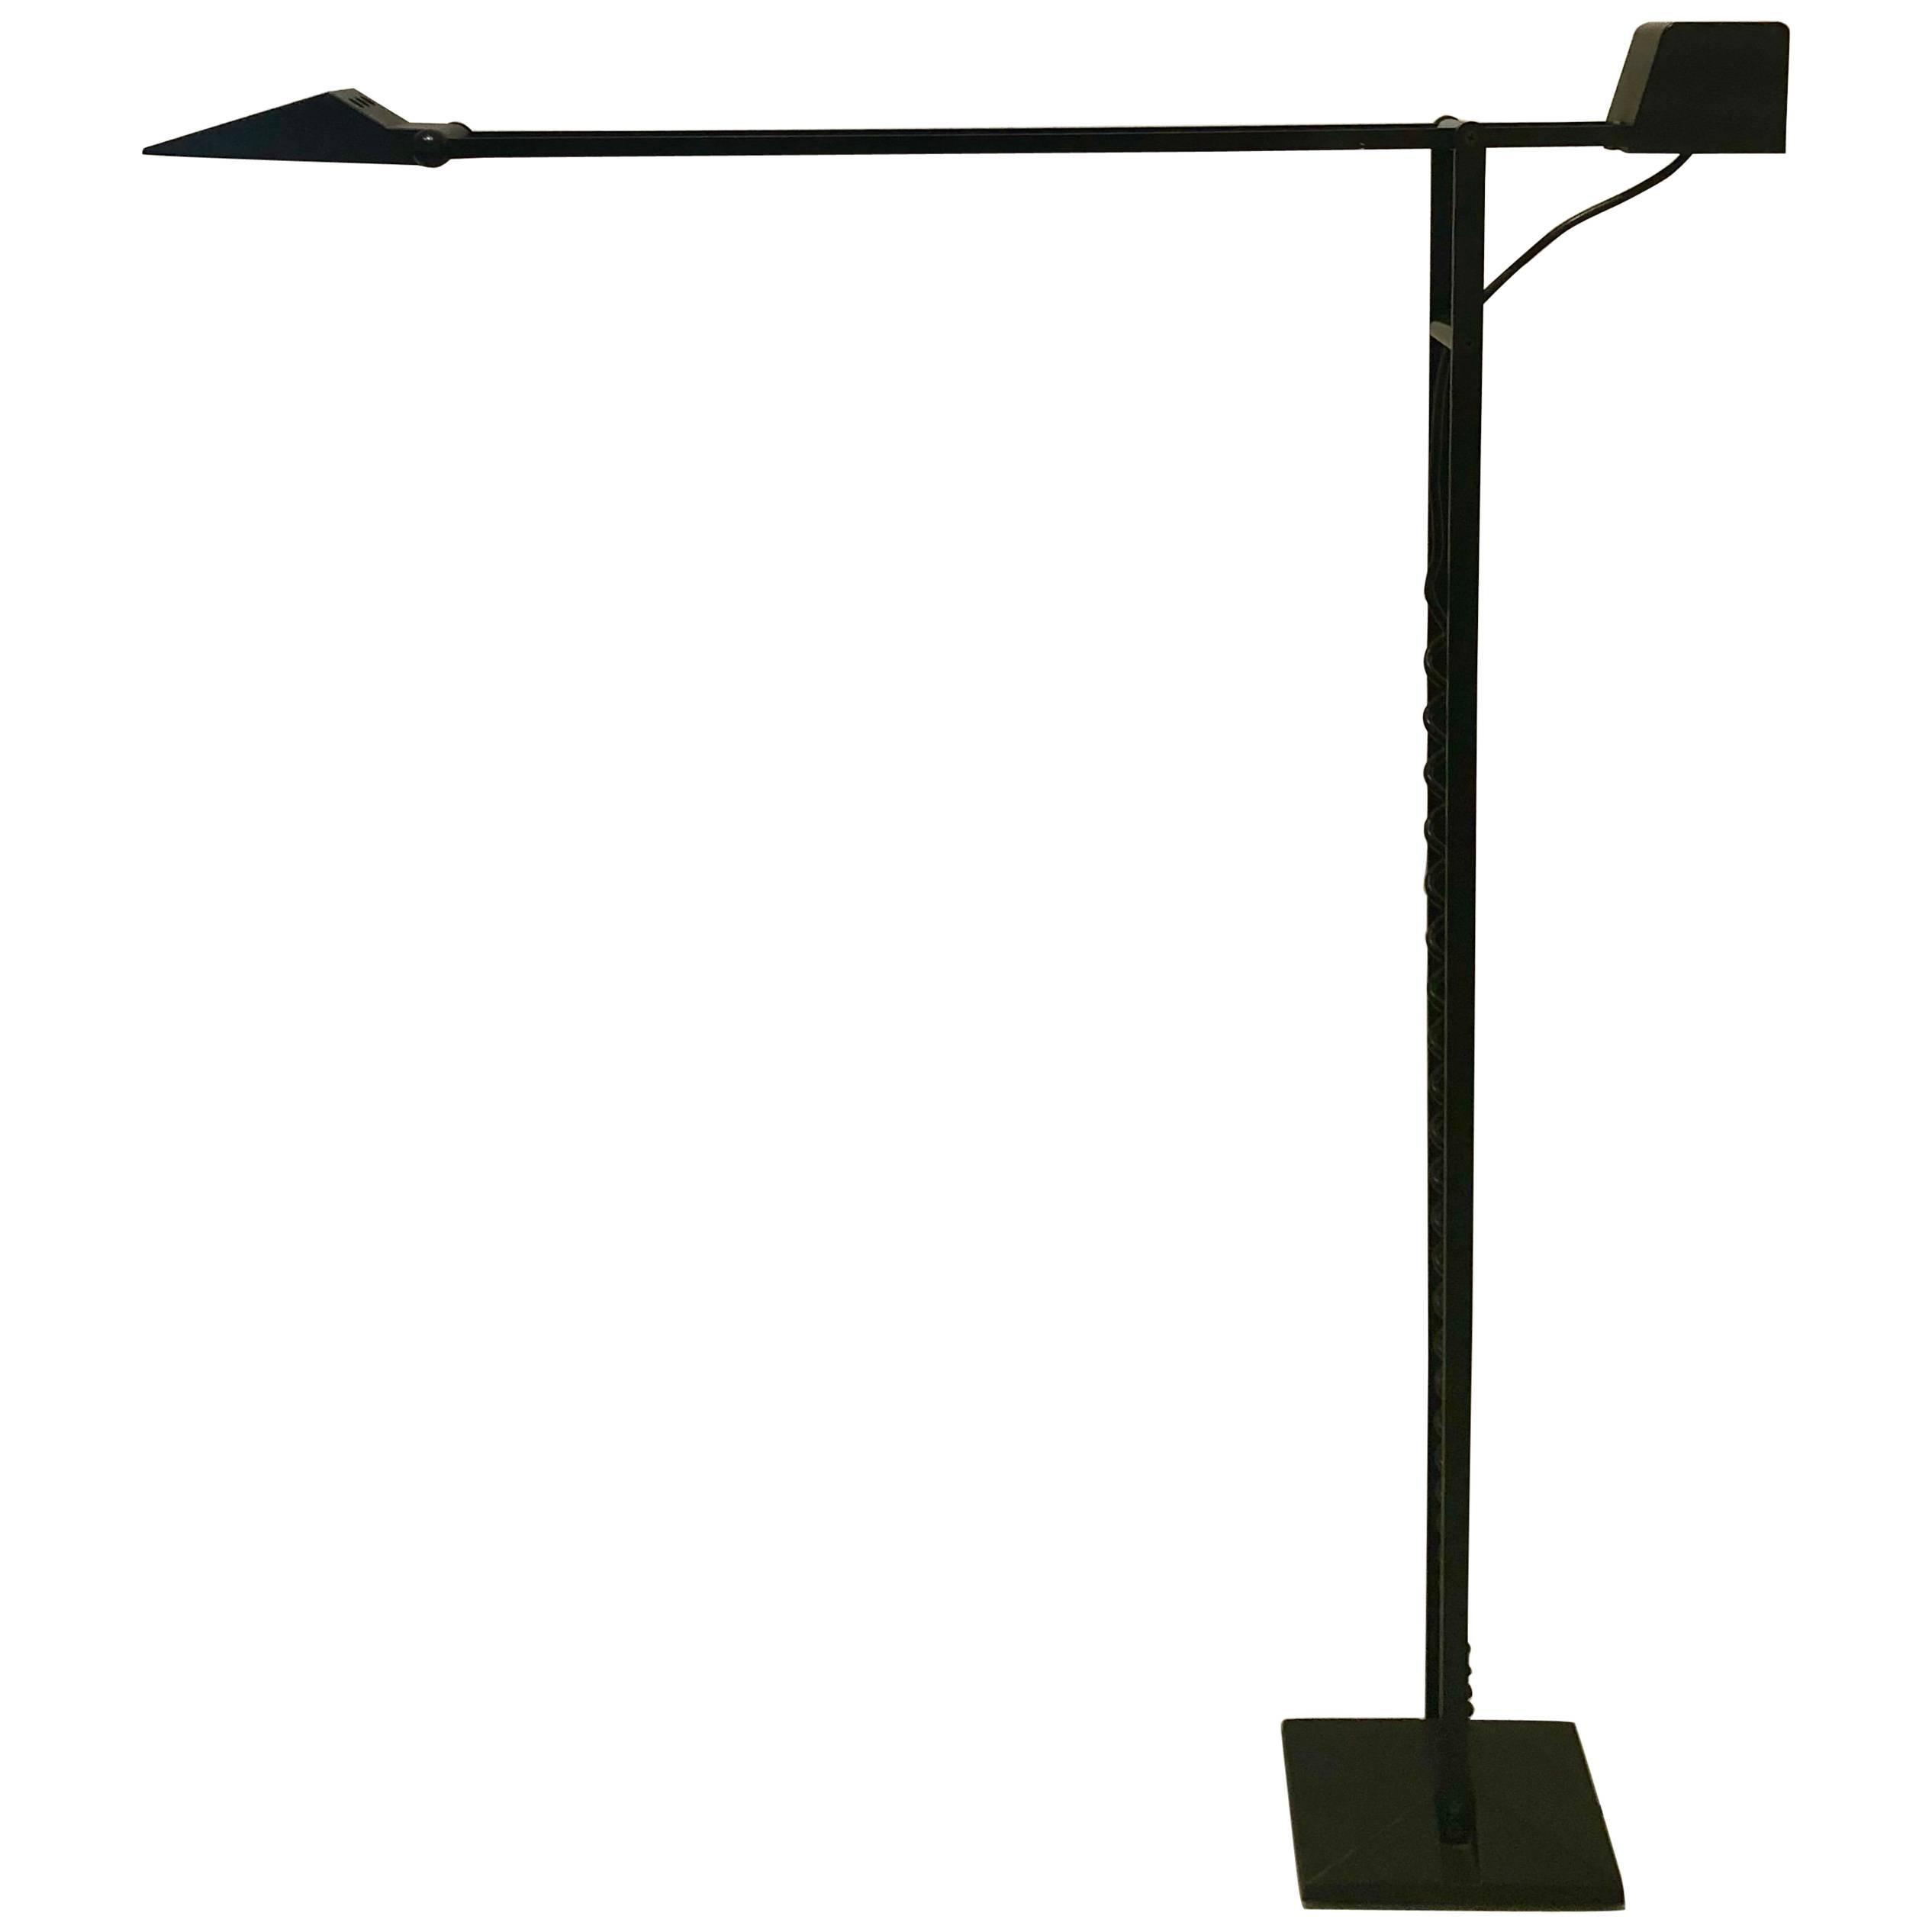 Multidirectional Postmodern Memphis Era Tall Italian Floor Lamp by Artup